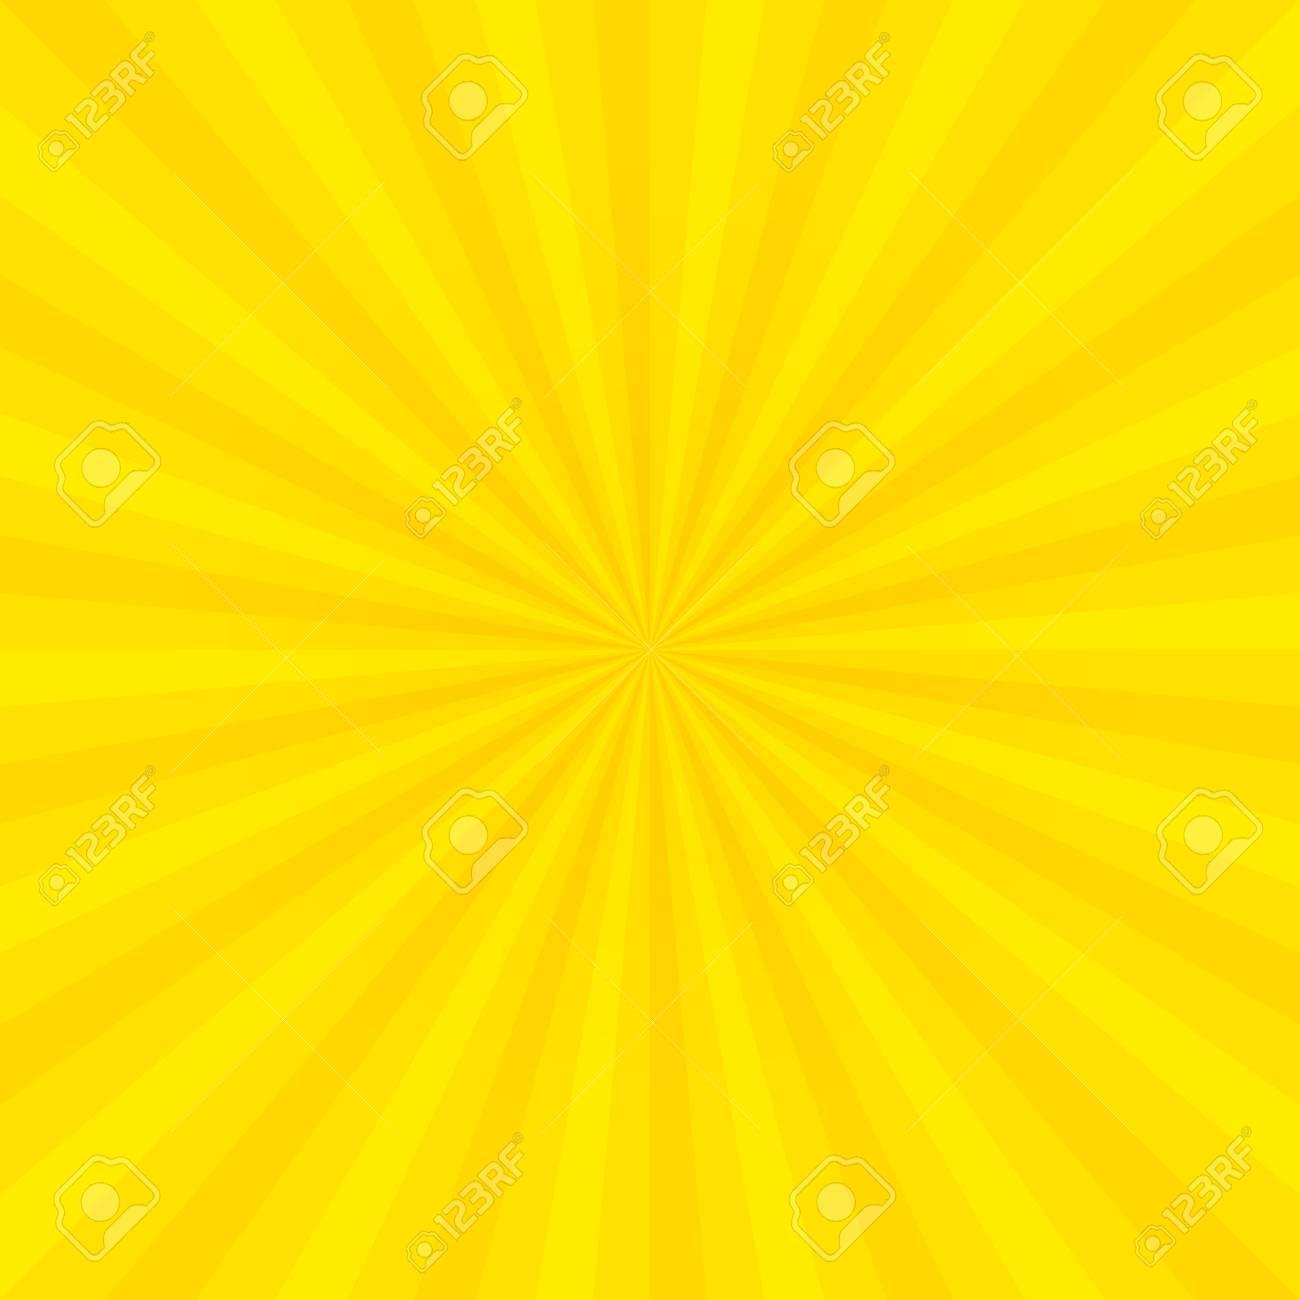 f8afa718ff35a Sun rays, sunburst, light rays, sunbeam background abstract yellow and  orange colors summer